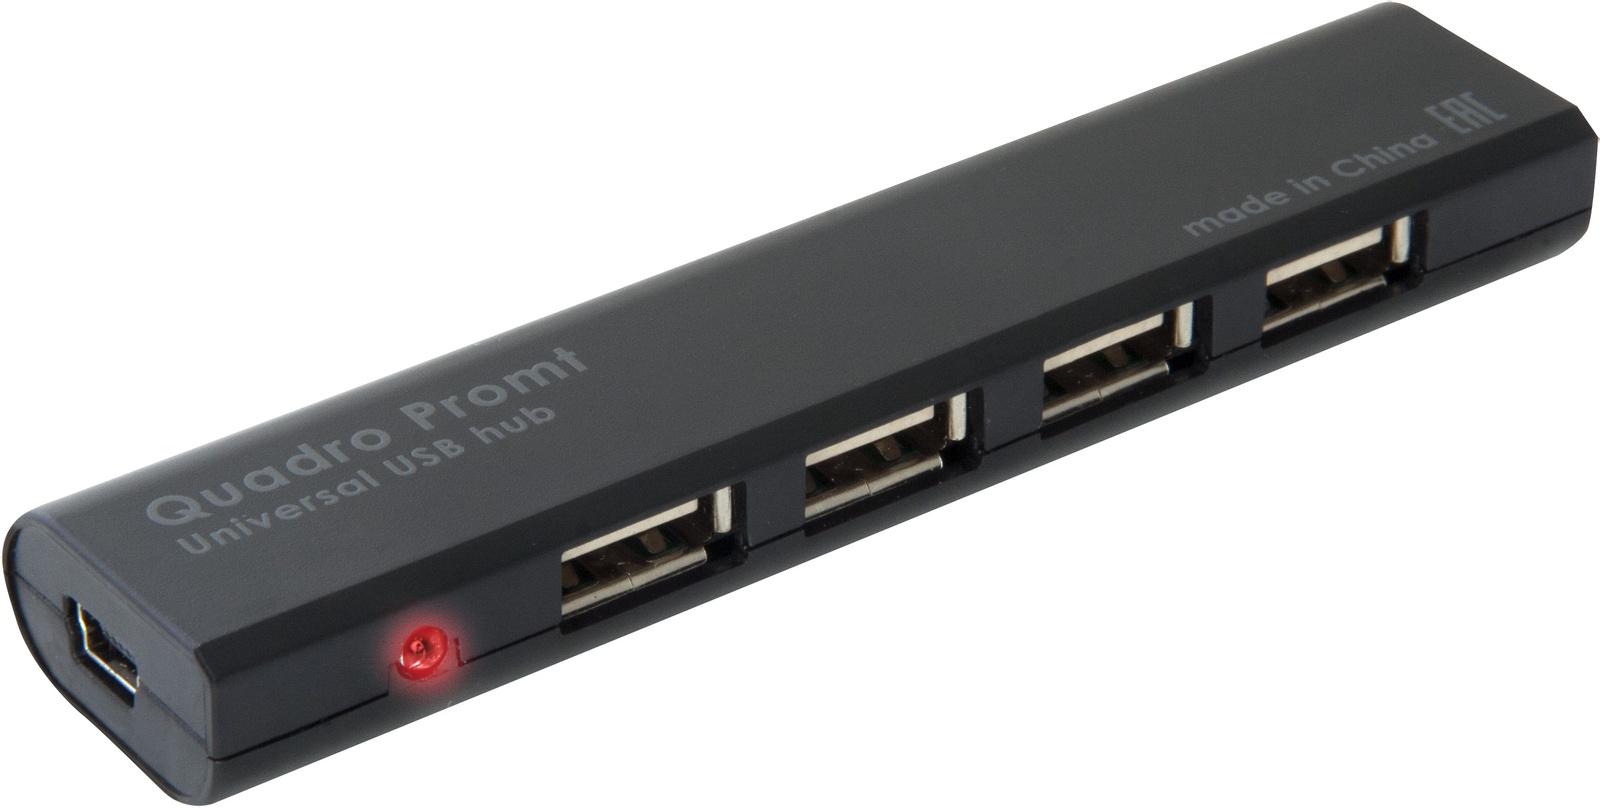 USB-разветвитель Defender Quadro Promt USB 2.0, 83200, 4 порта